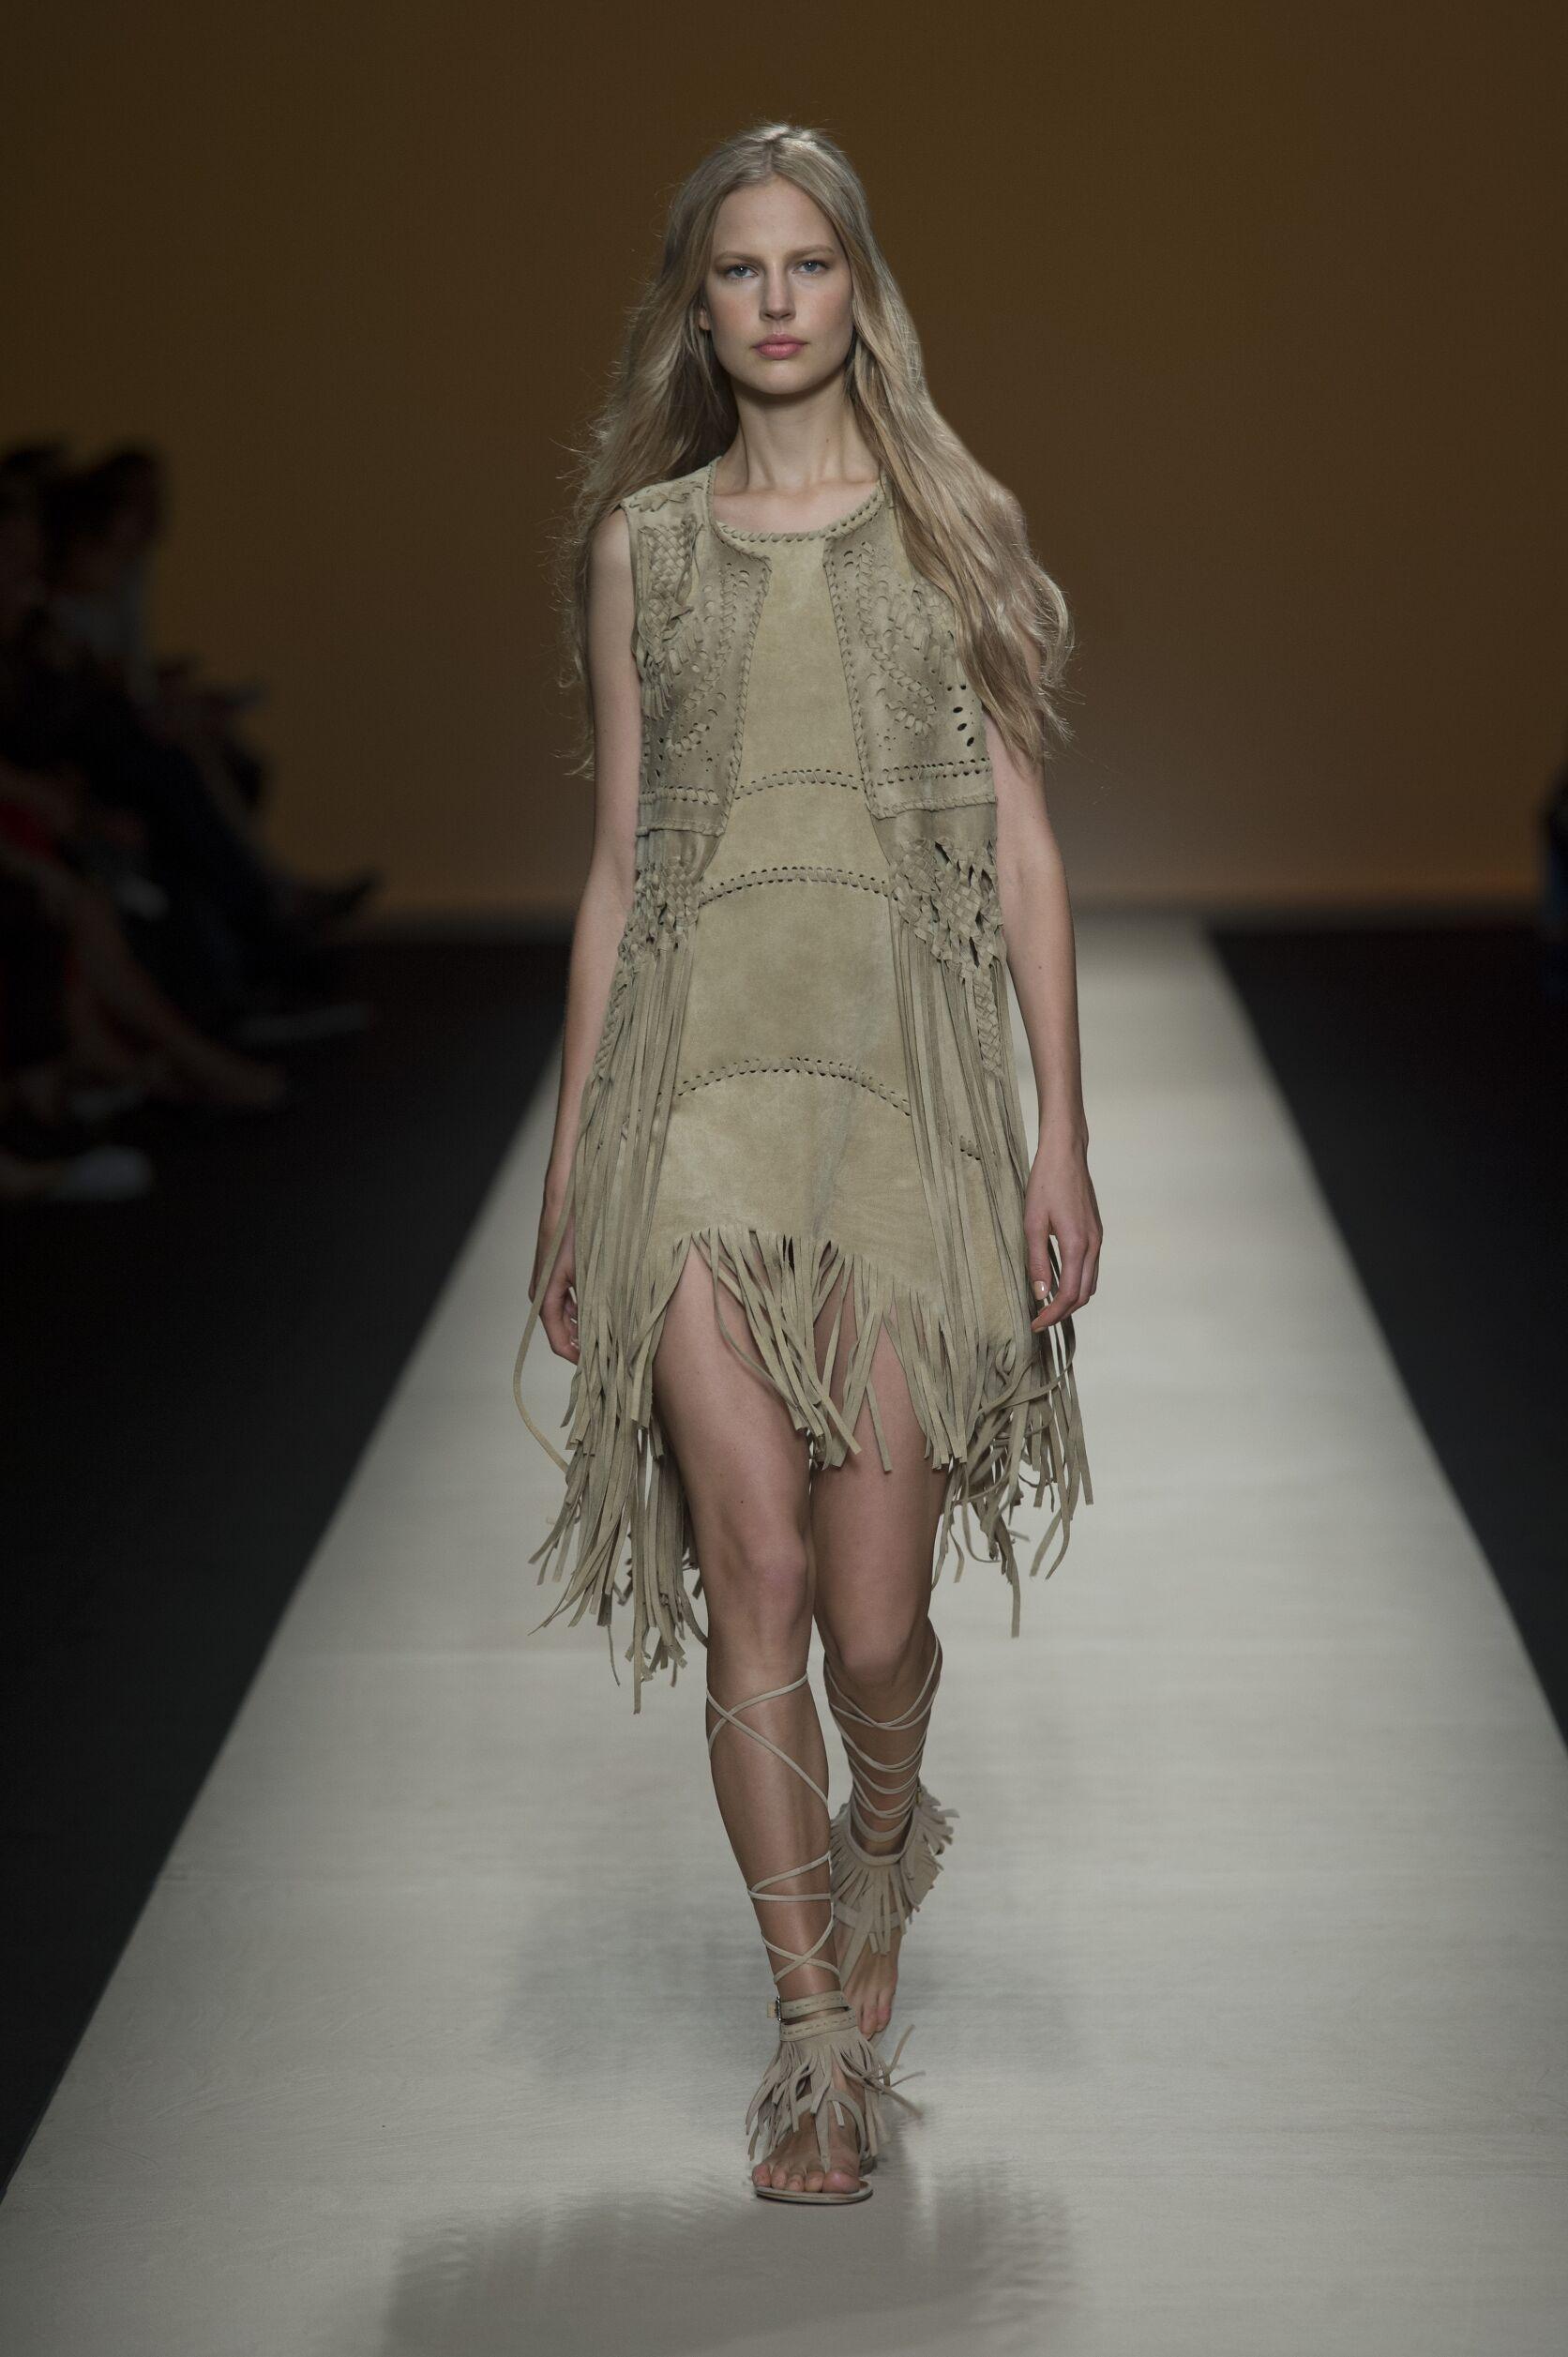 2015 Catwalk Alberta Ferretti Woman Fashion Show Summer